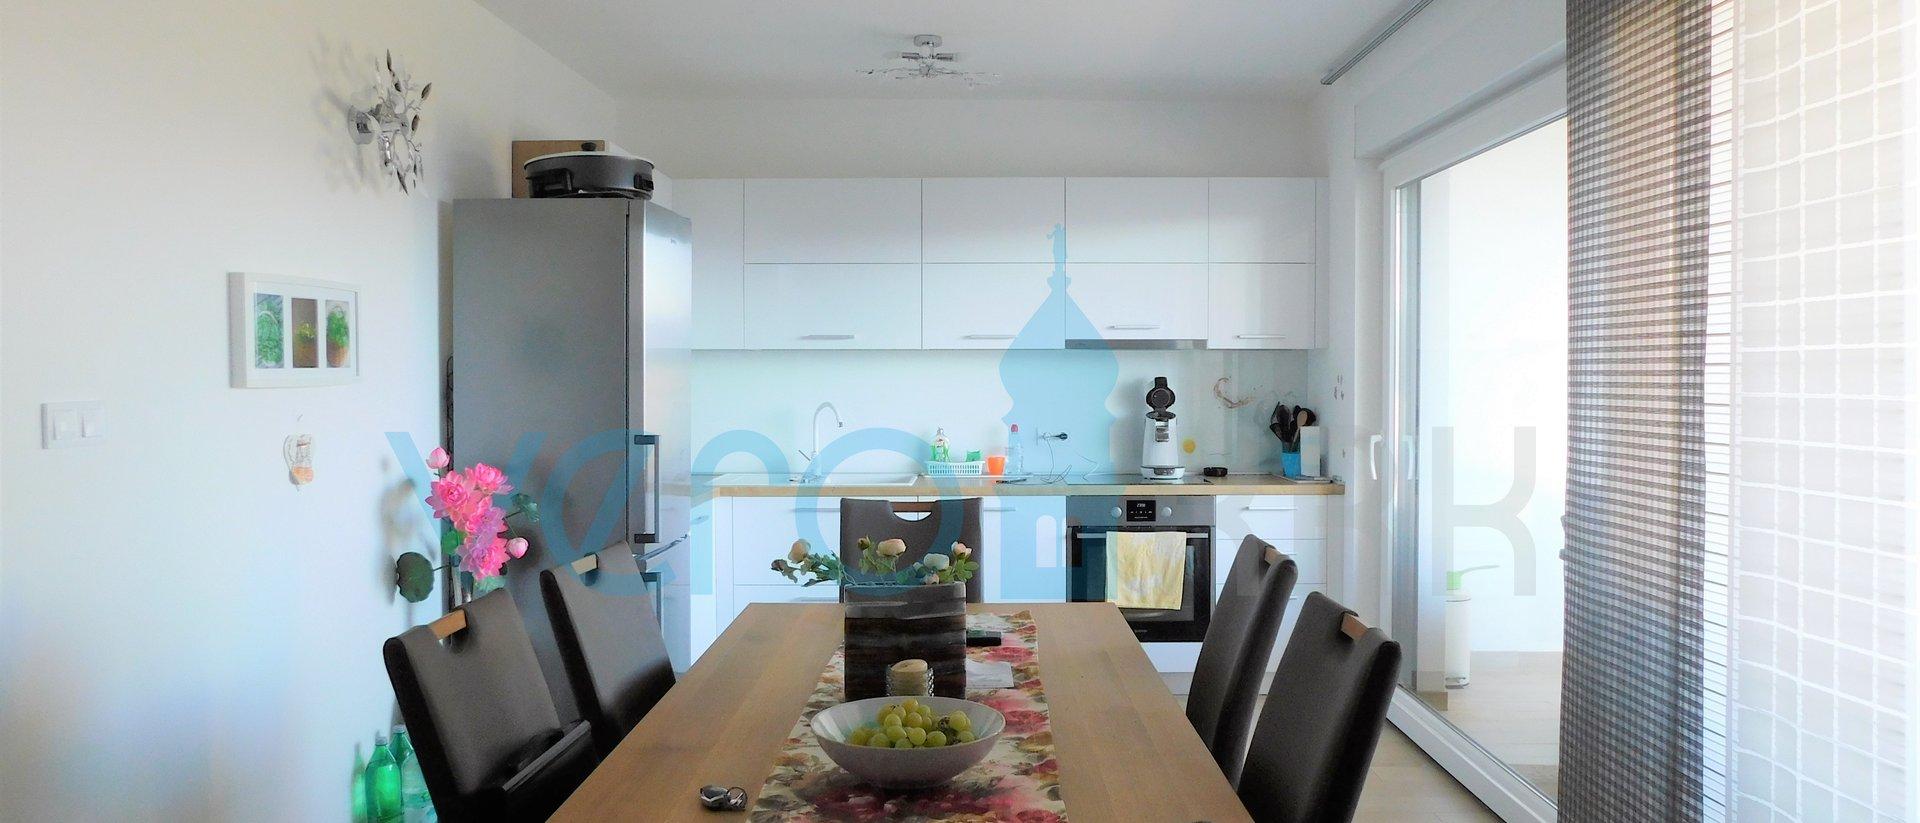 Appartamento, 110 m2, Vendita, Malinska